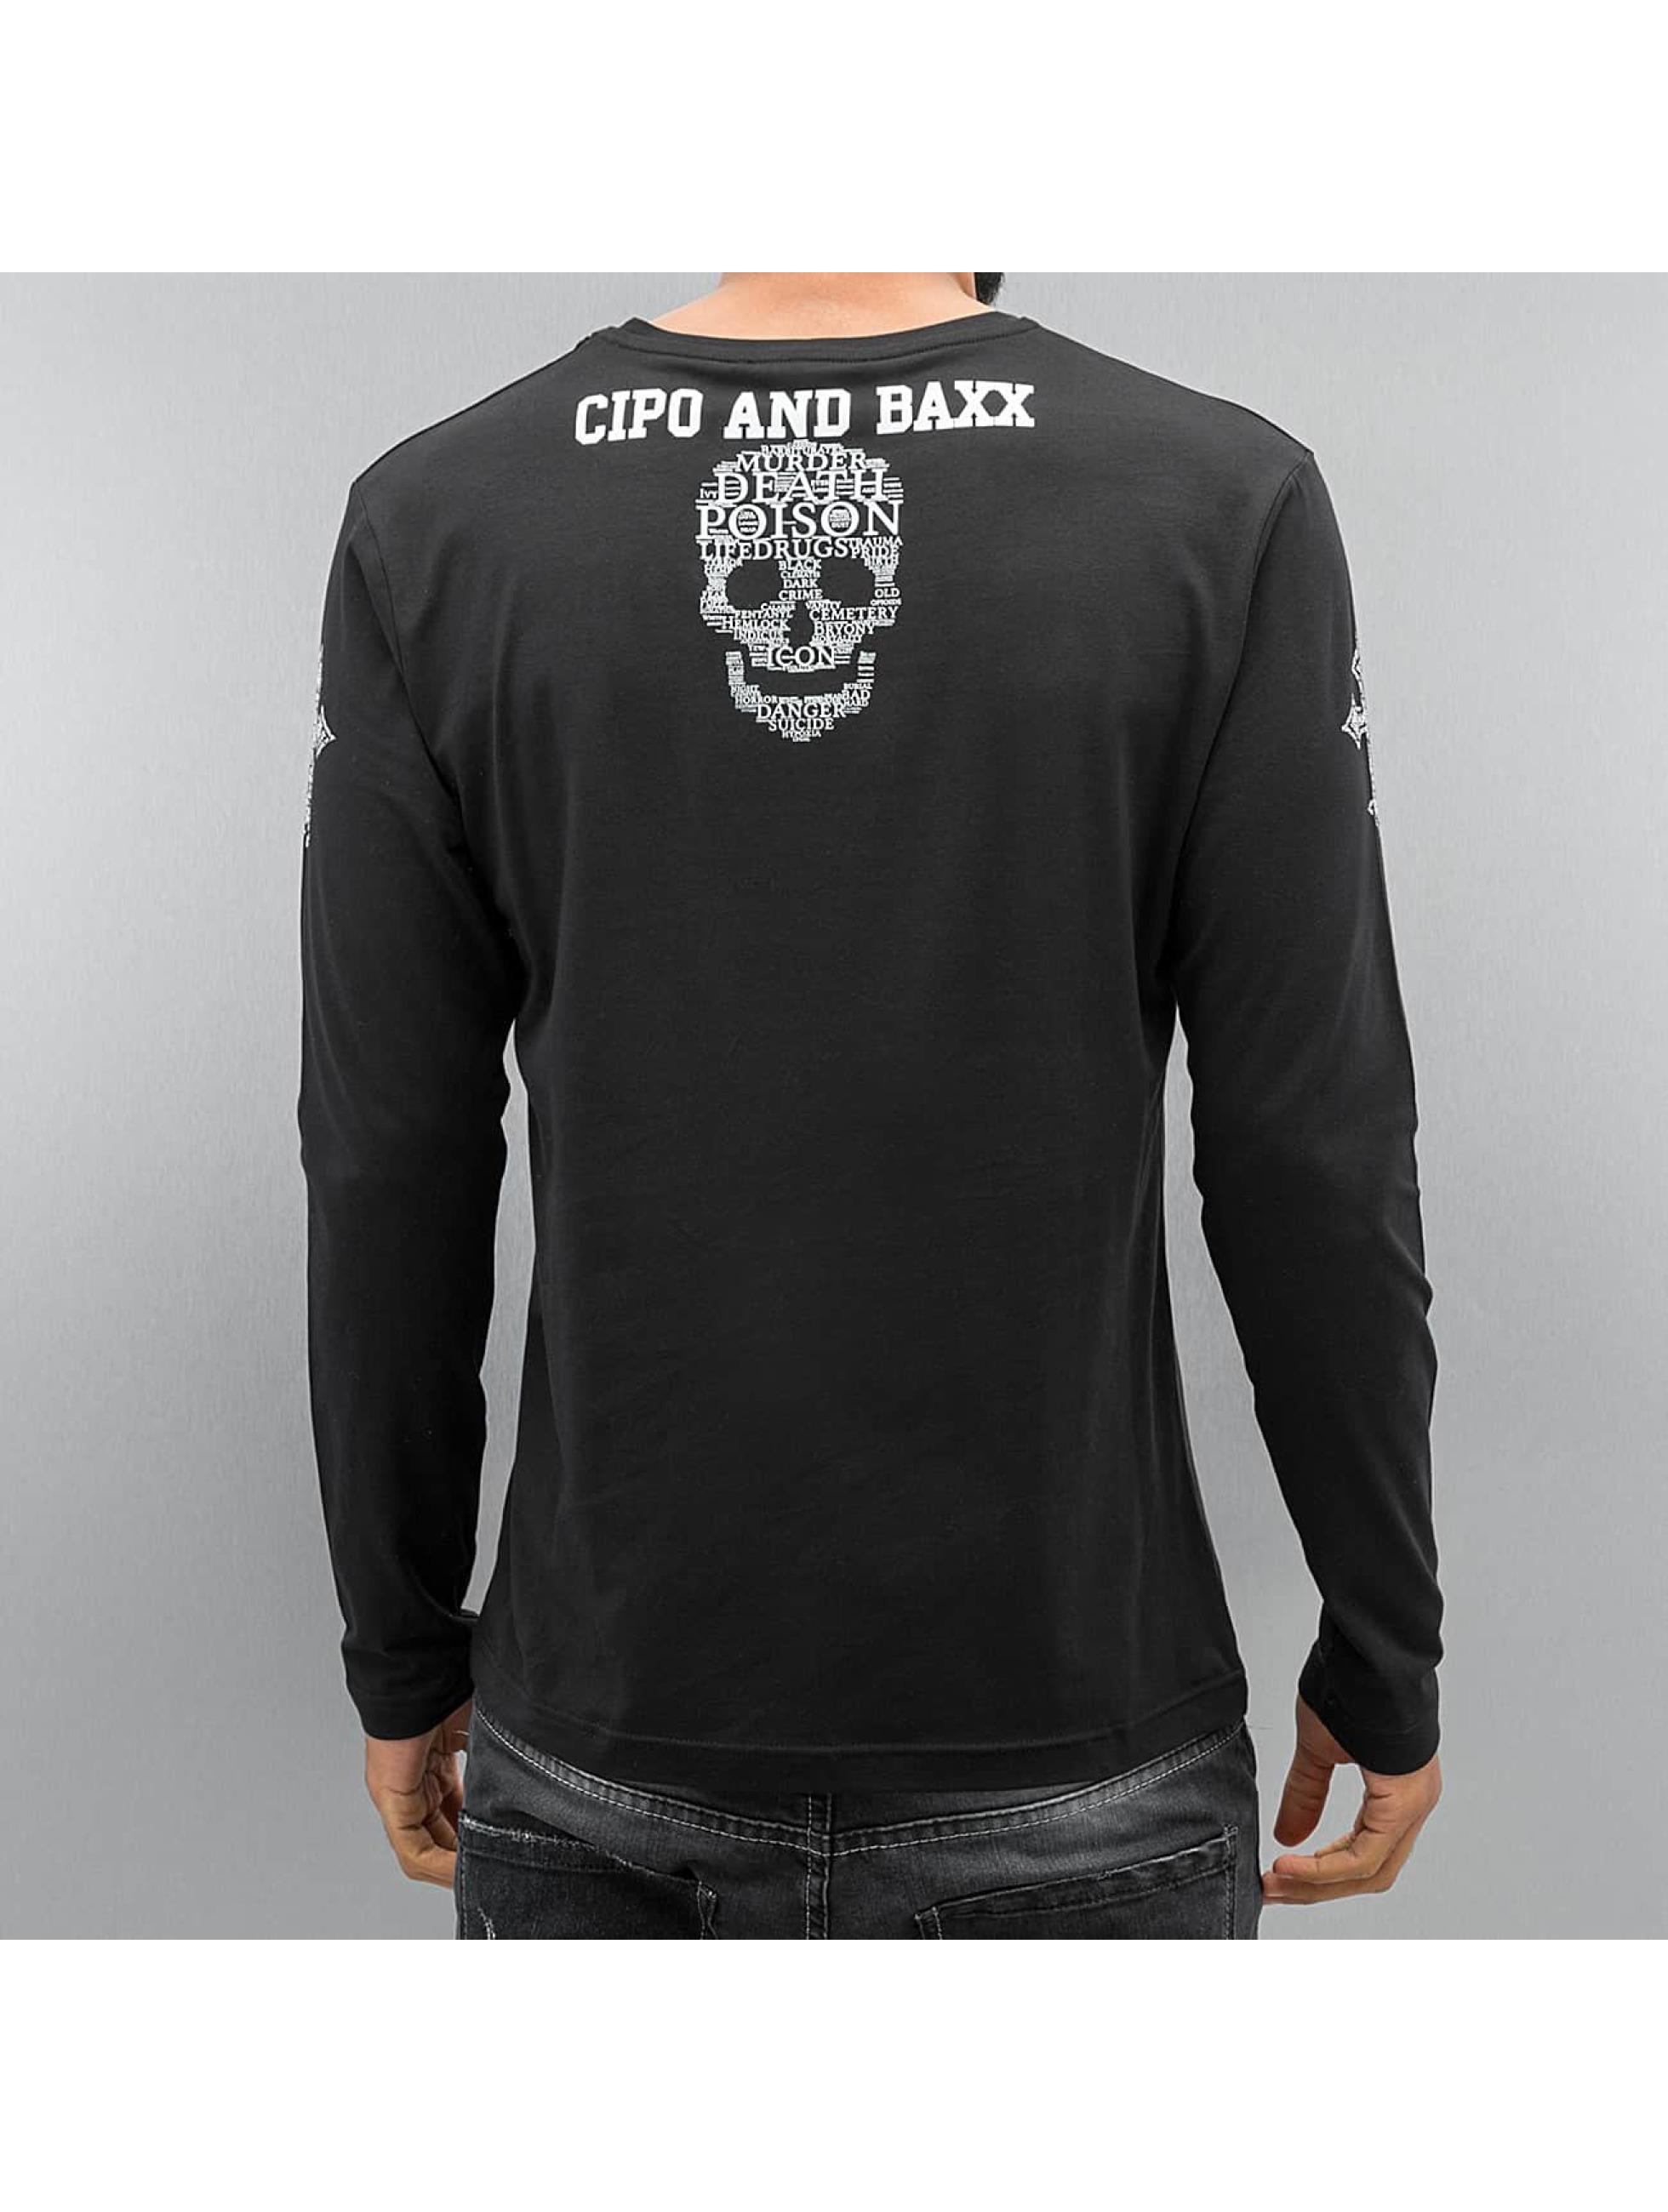 Cipo & Baxx T-Shirt manches longues Skull noir